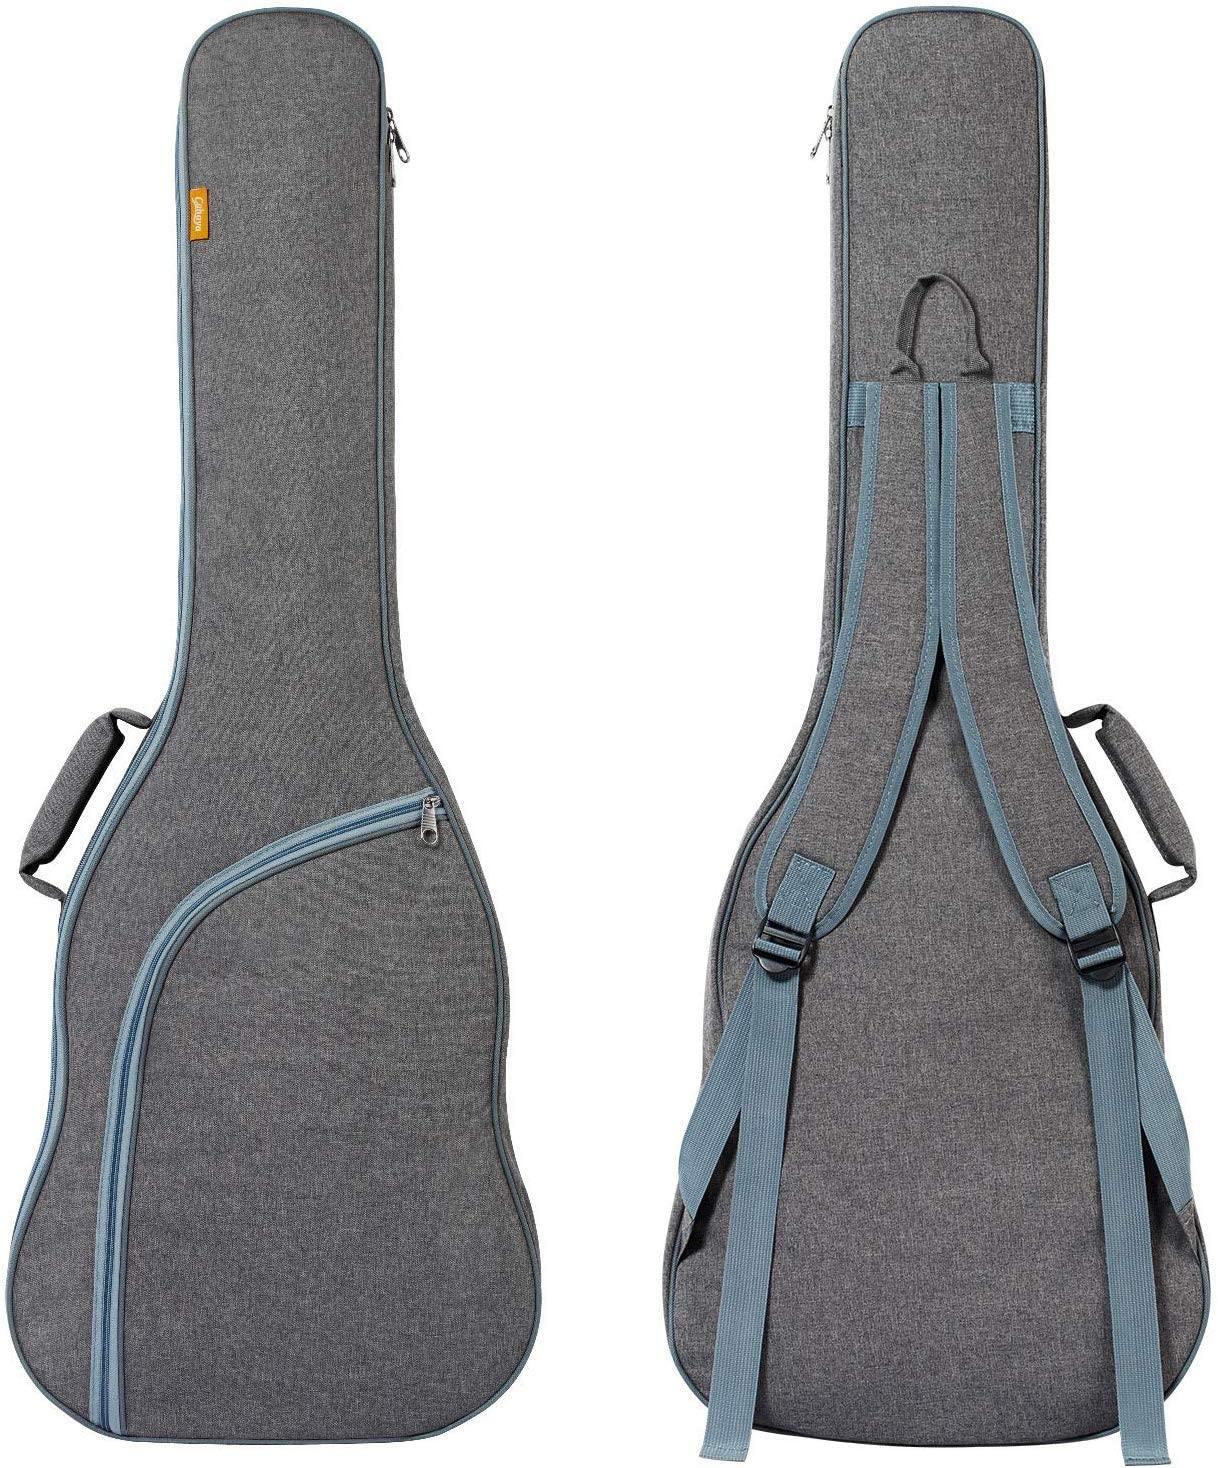 CAHAYA Electric Guitar Bag Padded Electric Guitar Gig Bag Case 0.35in Padding Dual Adjustable Shoulder Strap Electric Guitar Case